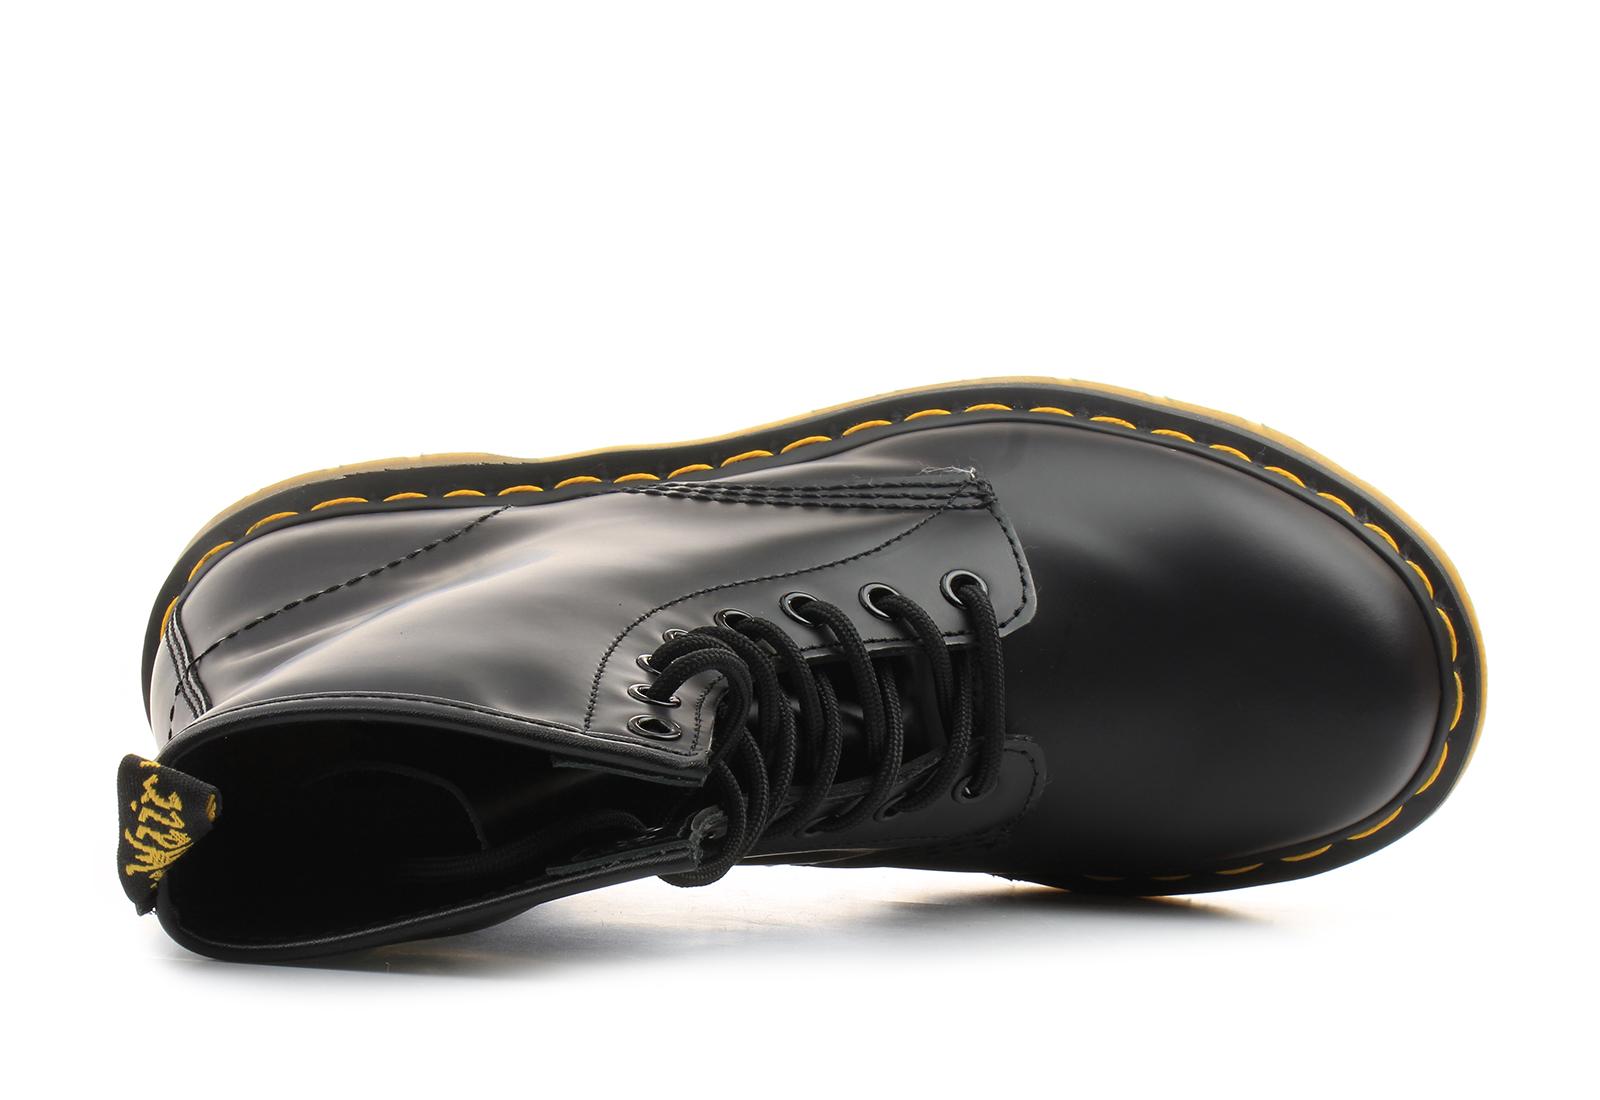 c9f2529e7cc6a Dr Martens Buty Zimowe - 1460 - 8 Eye Boot - DM11821006 - Obuwie i ...